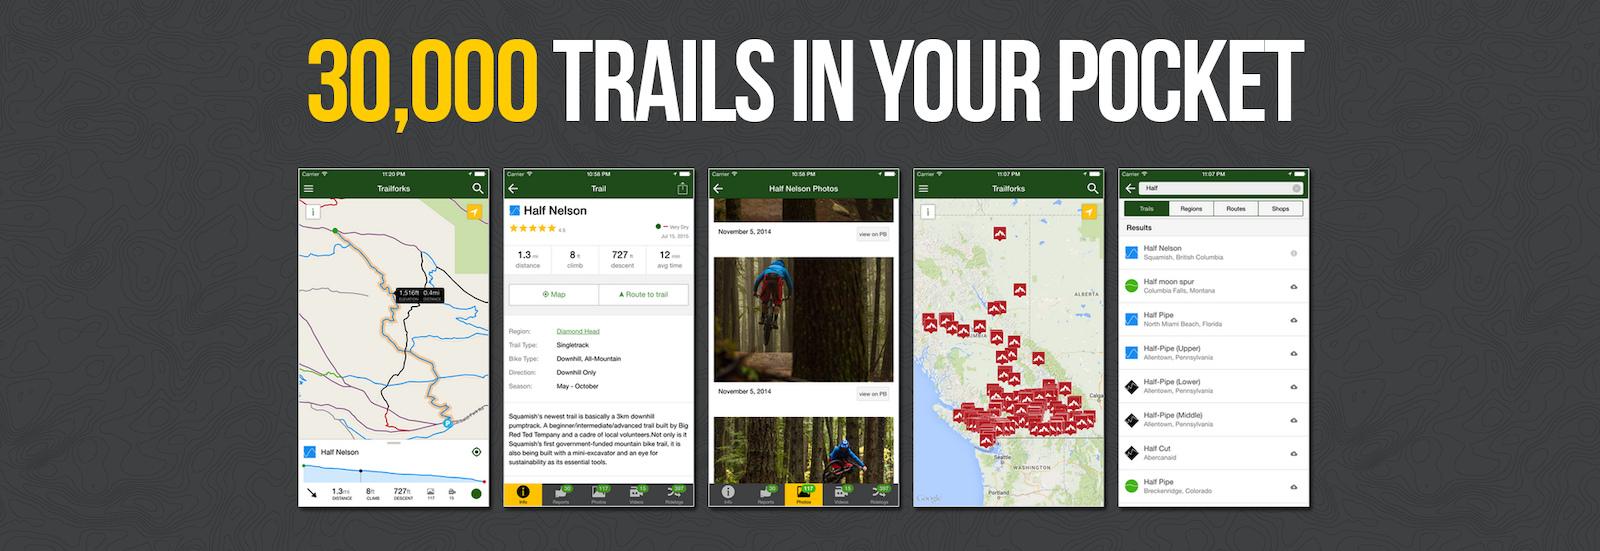 worldwide offline trail maps